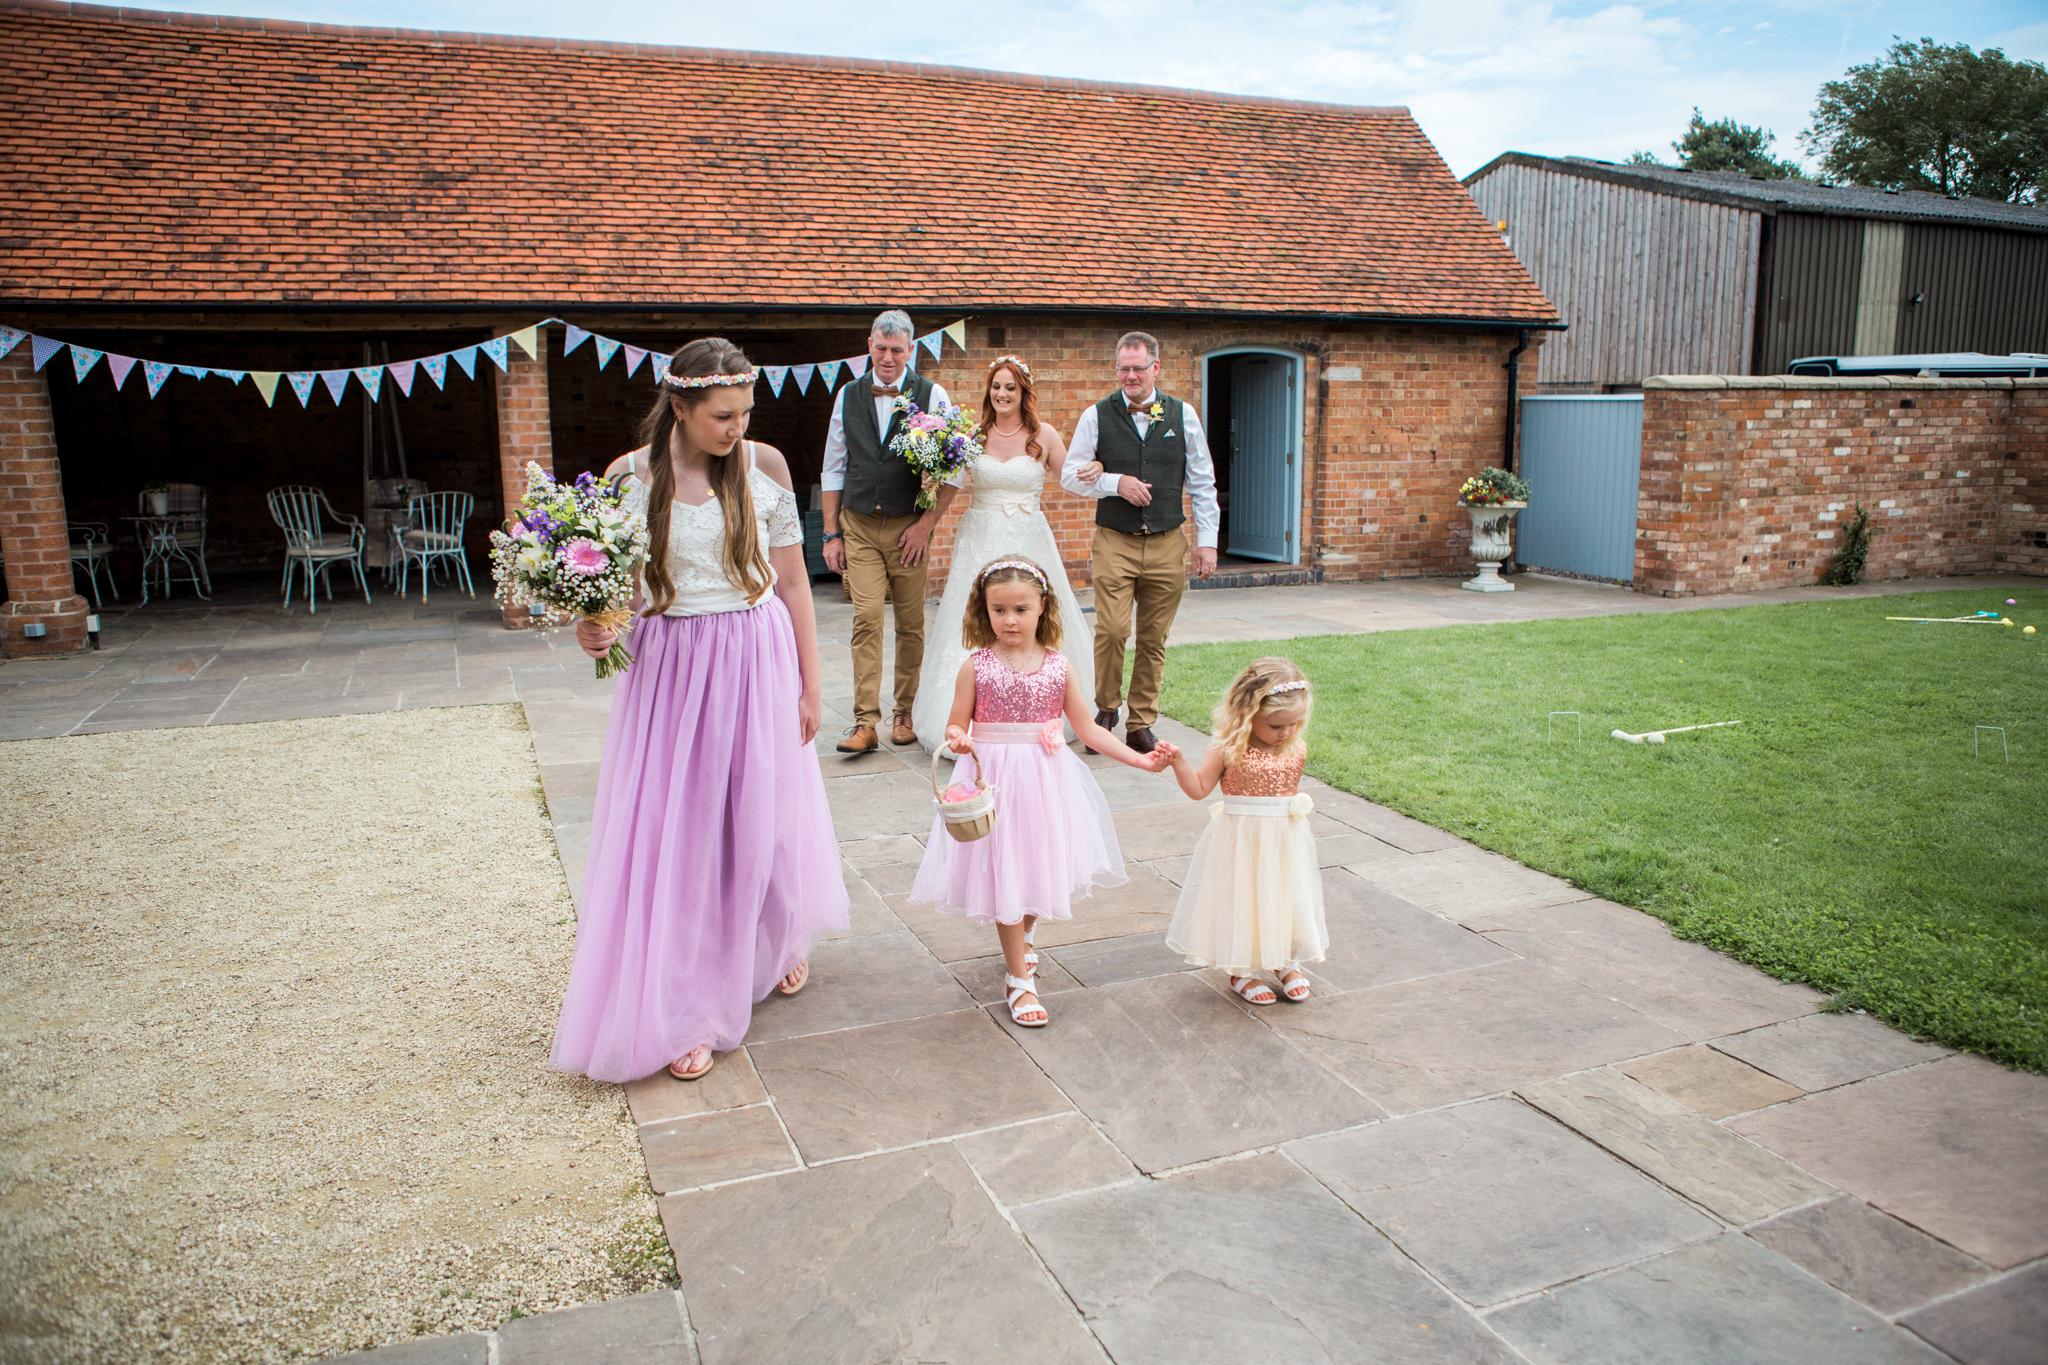 Rowsie & Lee, Swallows Nest Barn Wedding, Cotswold wedding photographer, Warwickshire Wedding Photographer-38.jpg